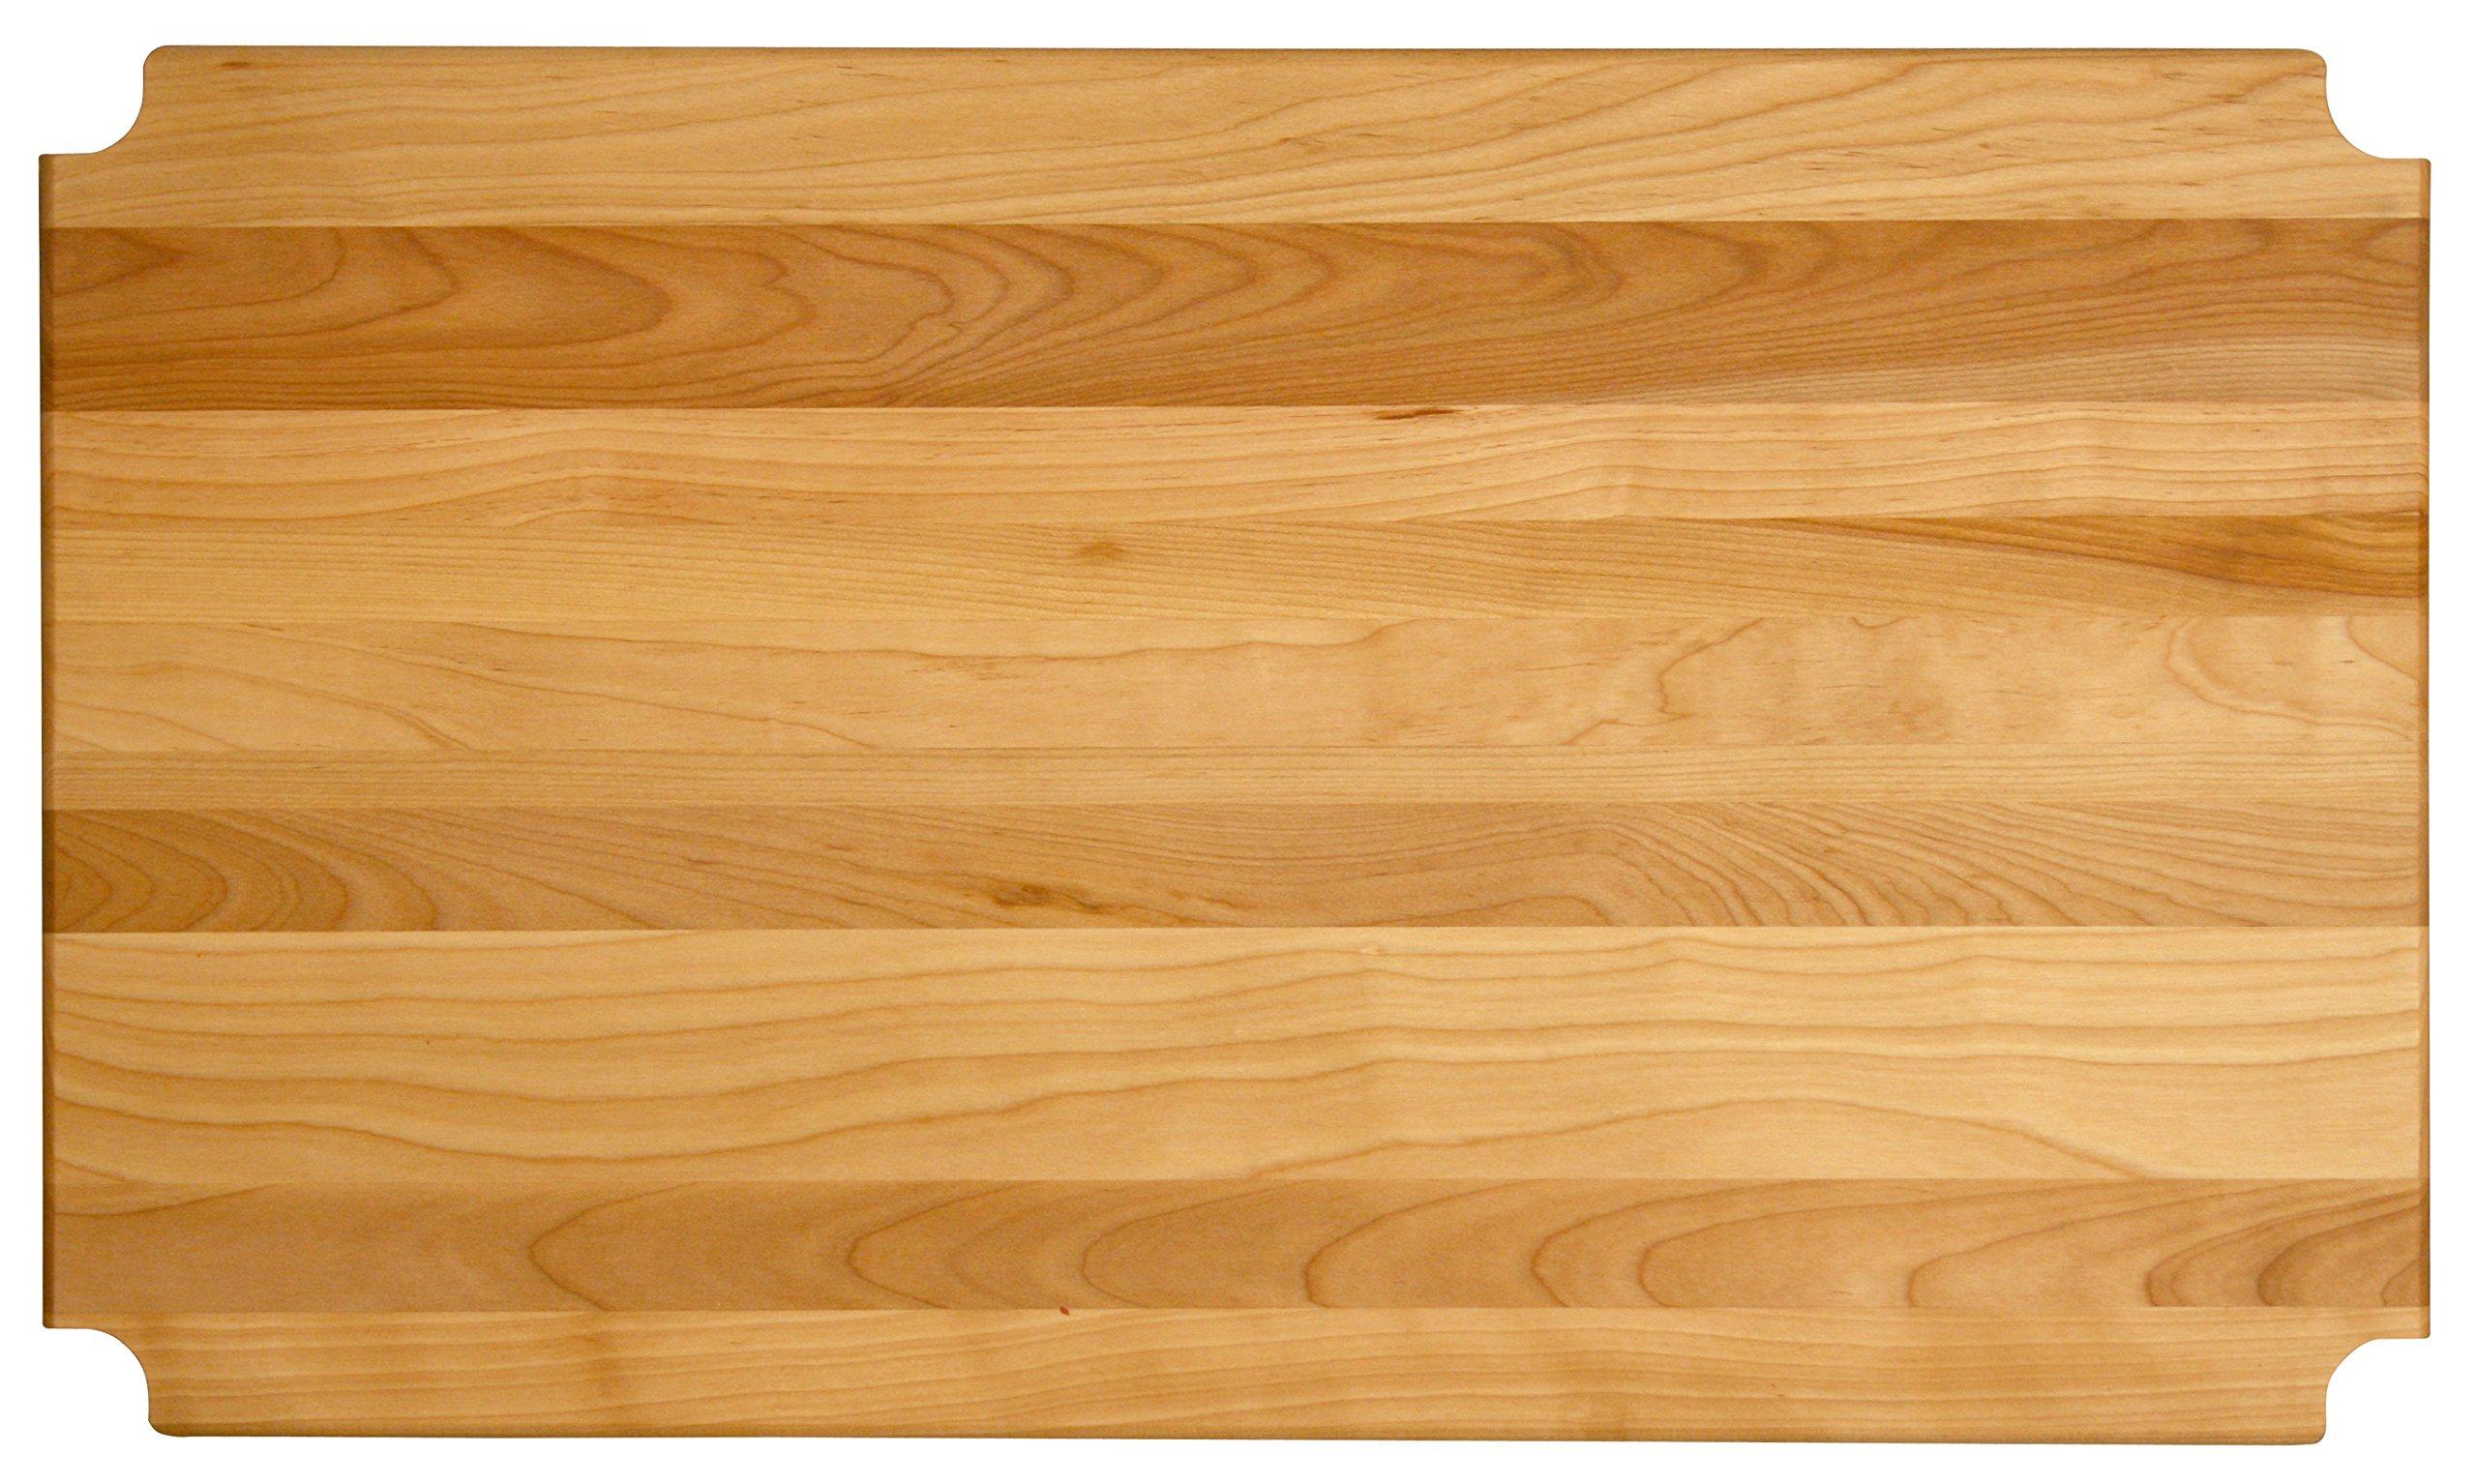 Catskill Craftsmen Hardwood Shelf Insert, Fits L-1430 Metro-Style Shelves, 1 Insert Piece Only